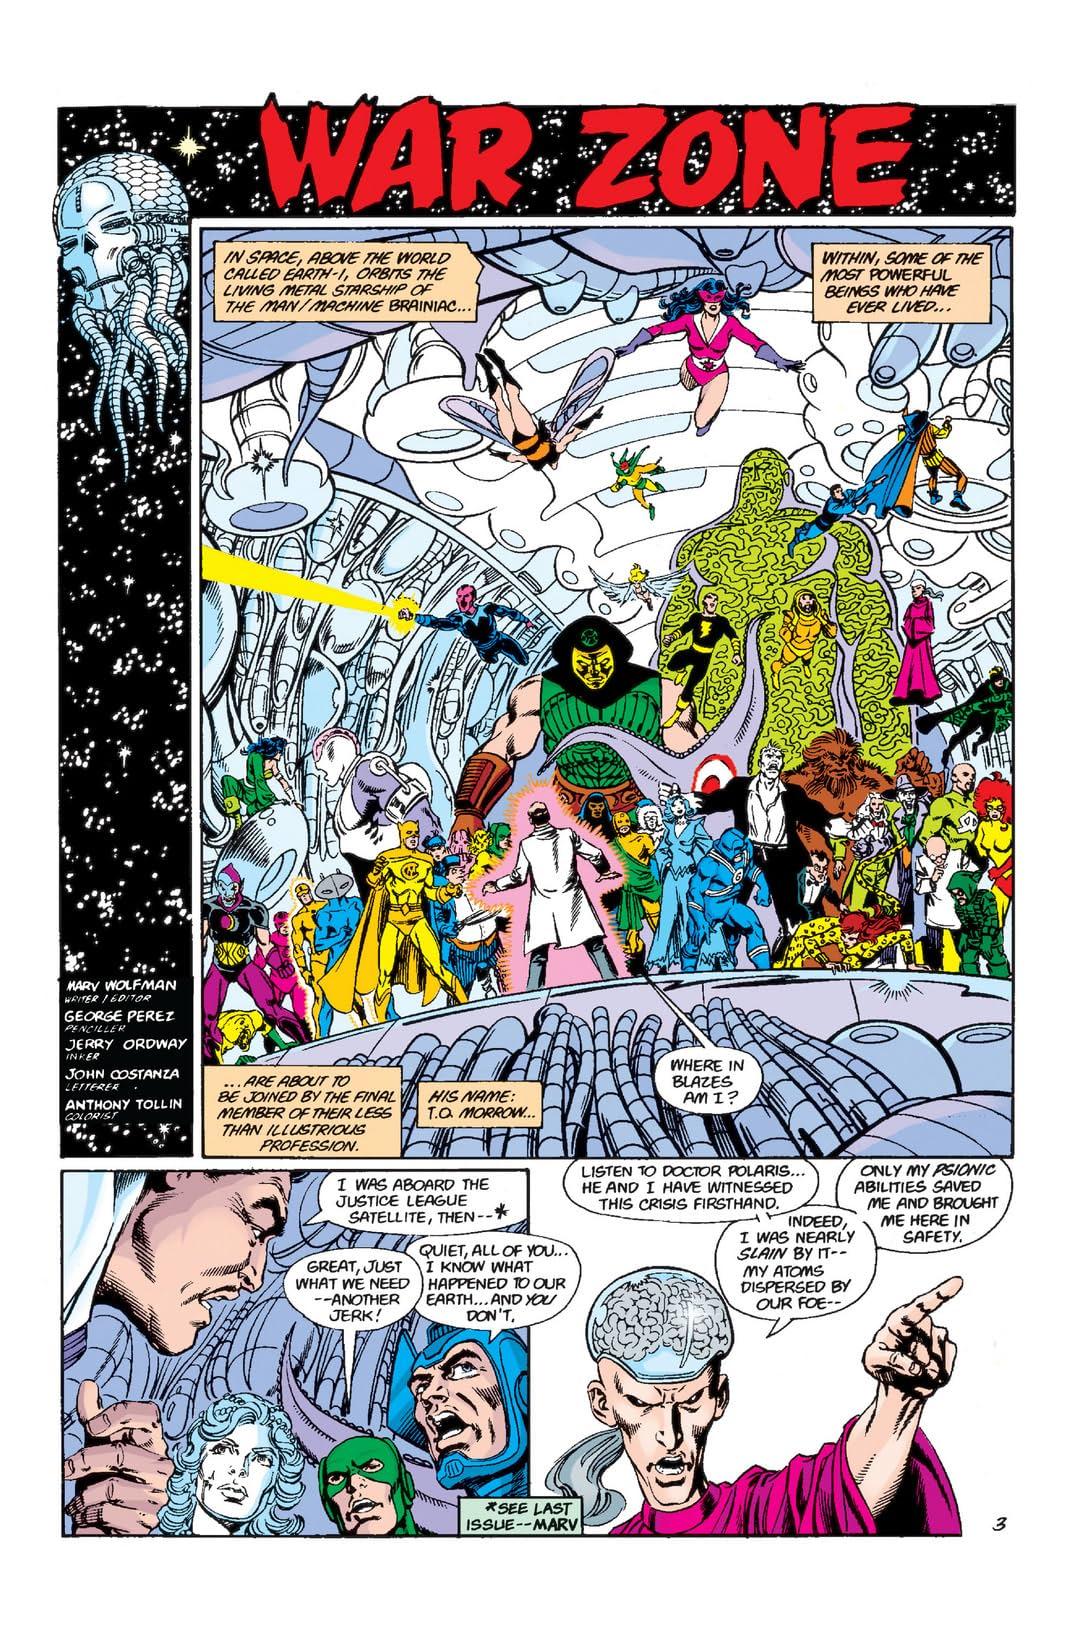 Crisis on Infinite Earths #9